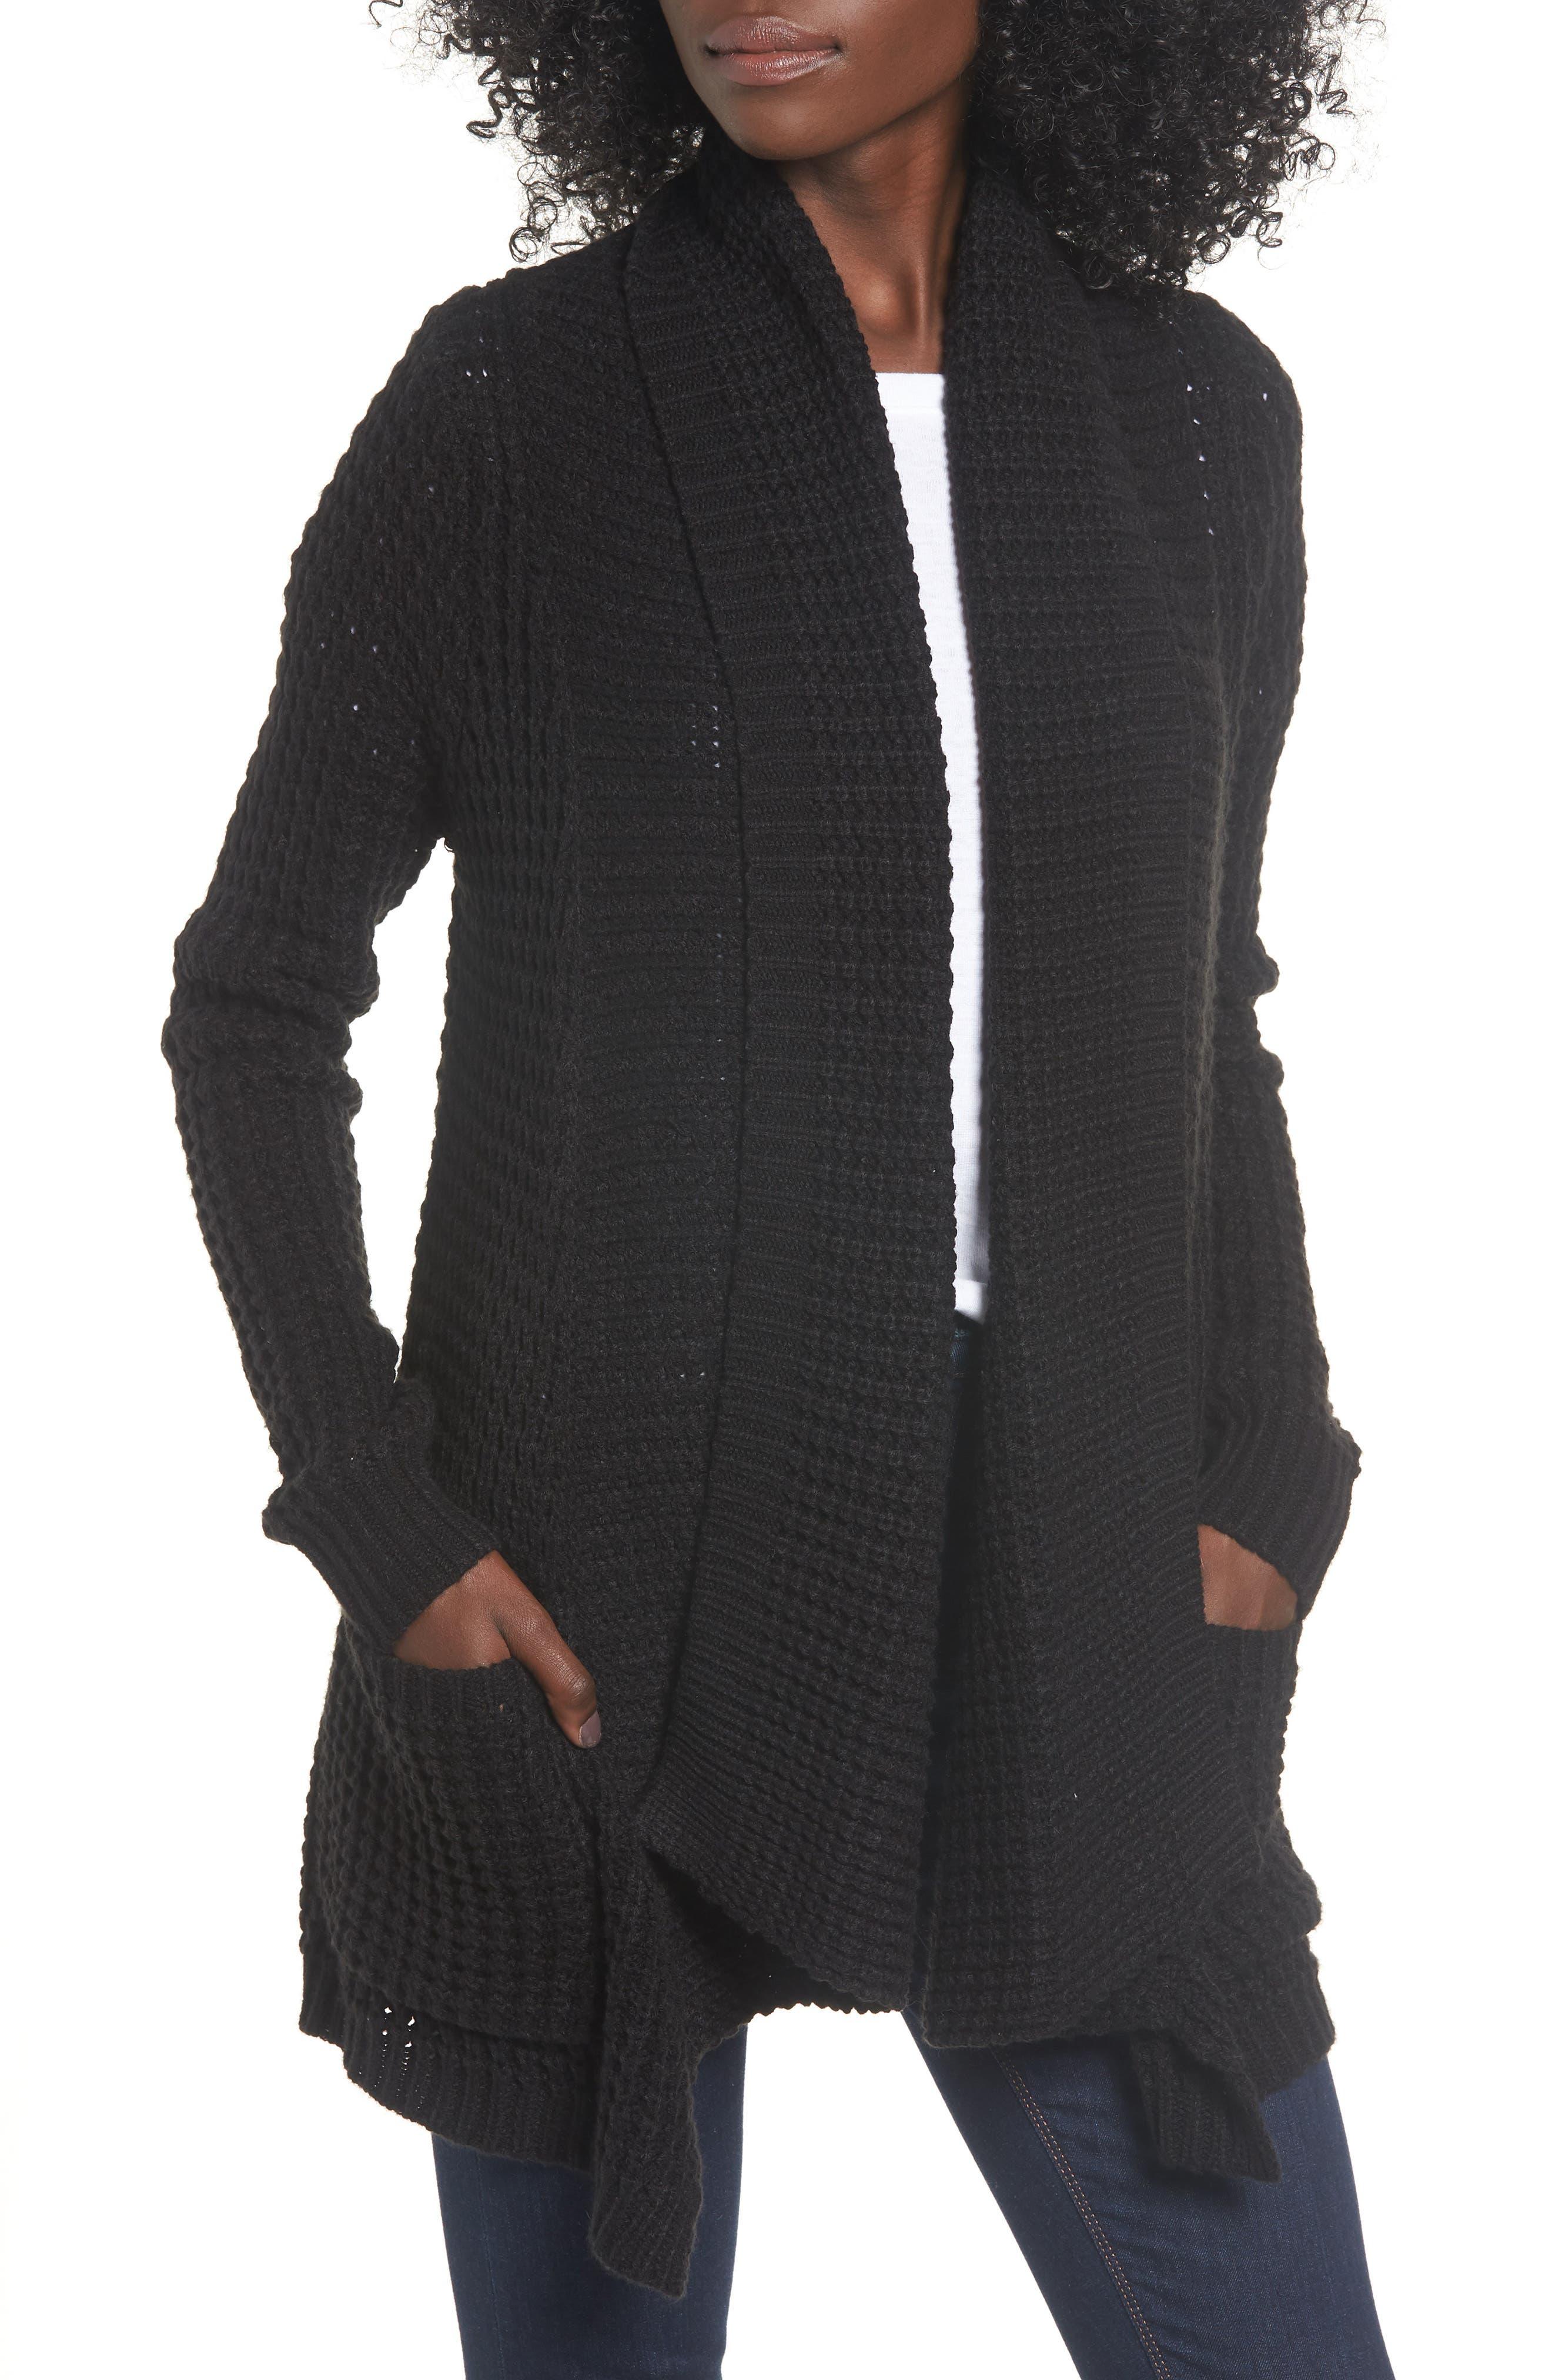 Rip Curl Shambala Knit Cardigan, Black